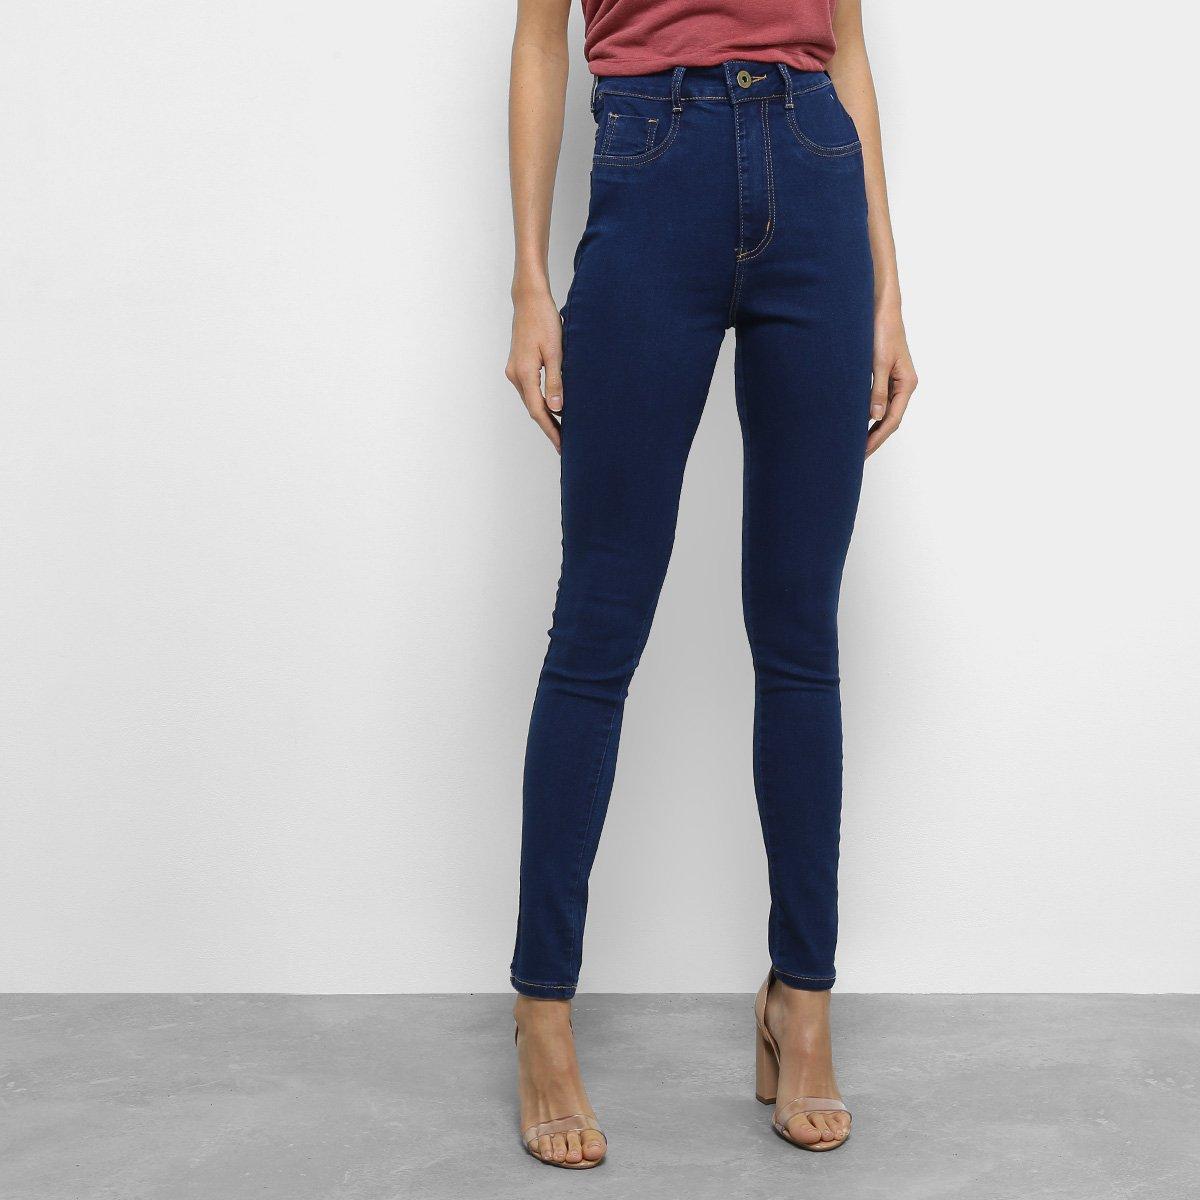 71b620da7 Calça jeans skinny sawary modeladora lavagem escura cintura alta feminina  undefined jpg 1200x1200 Undefined sawary calcas